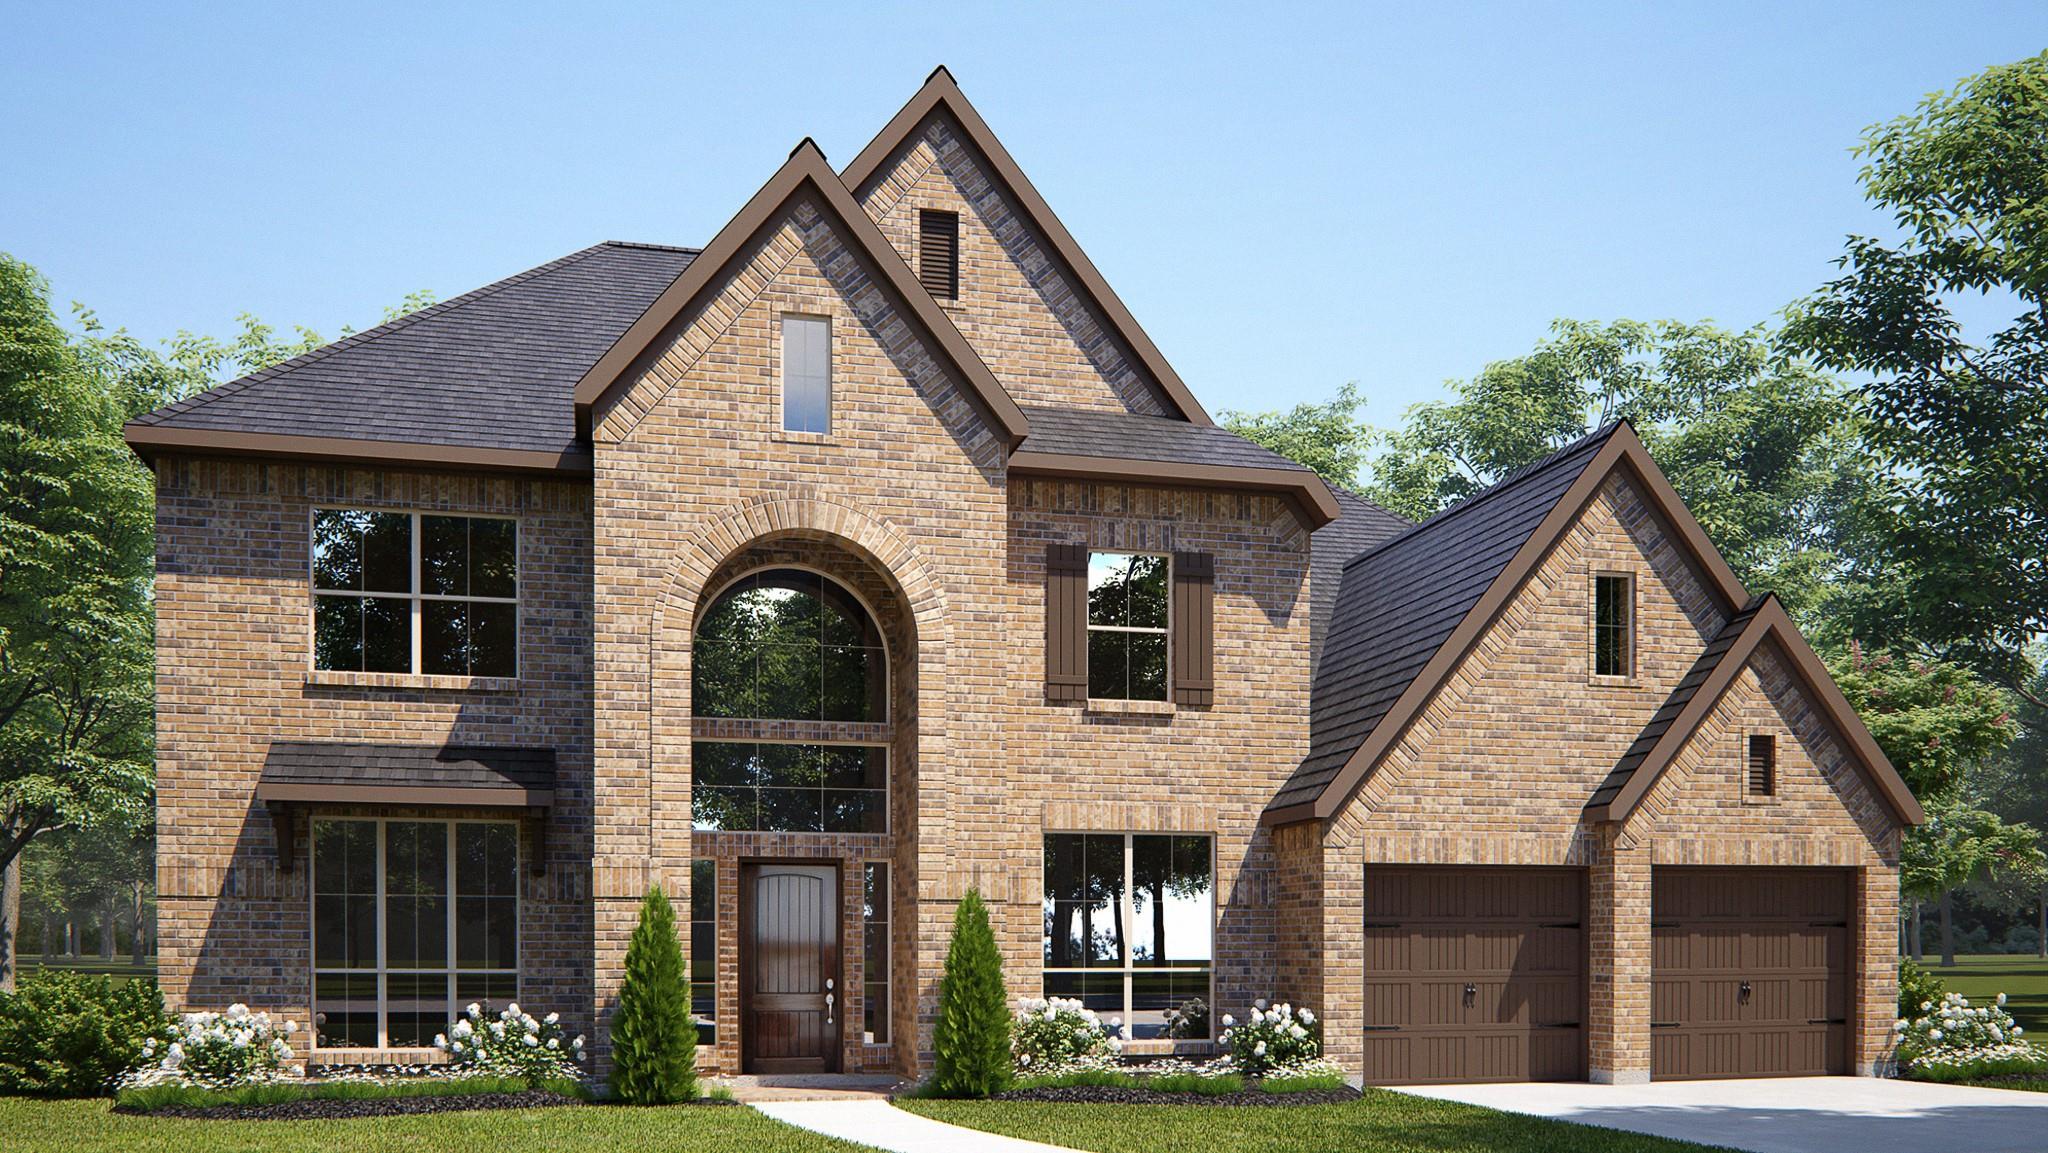 23806 Rimini Valley Way Property Photo - Katy, TX real estate listing